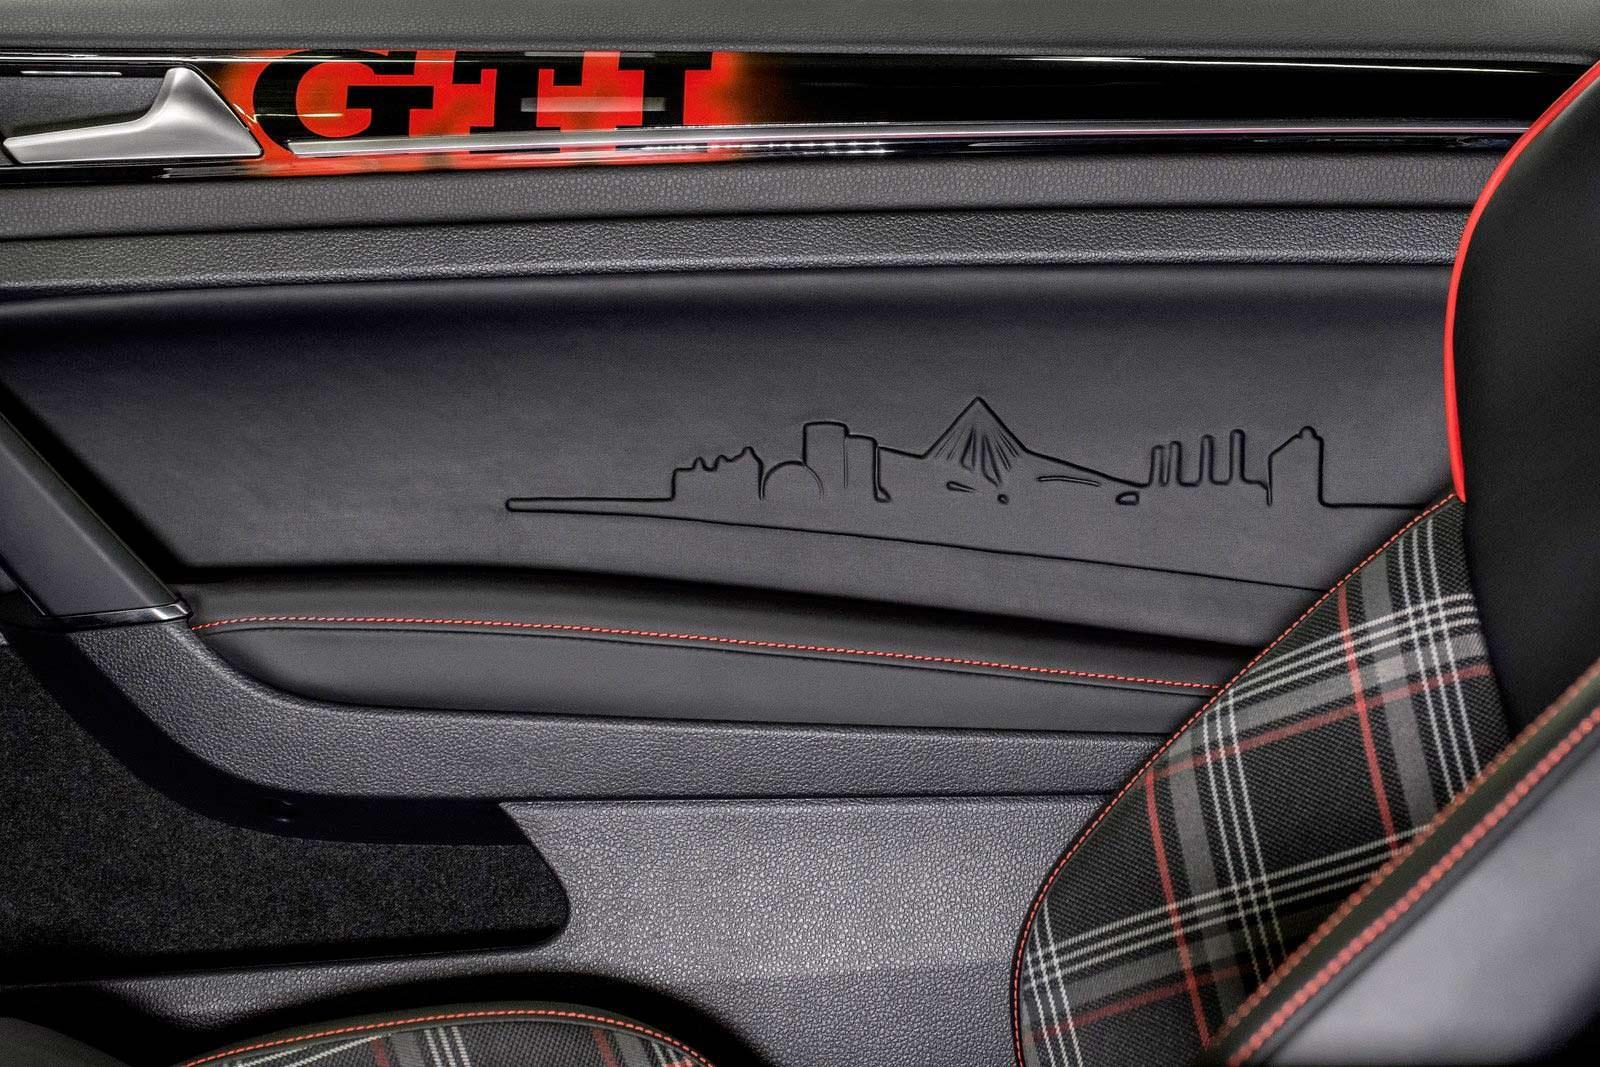 Отделка дверей VW Golf GTI Wolfsburg Edition 2014